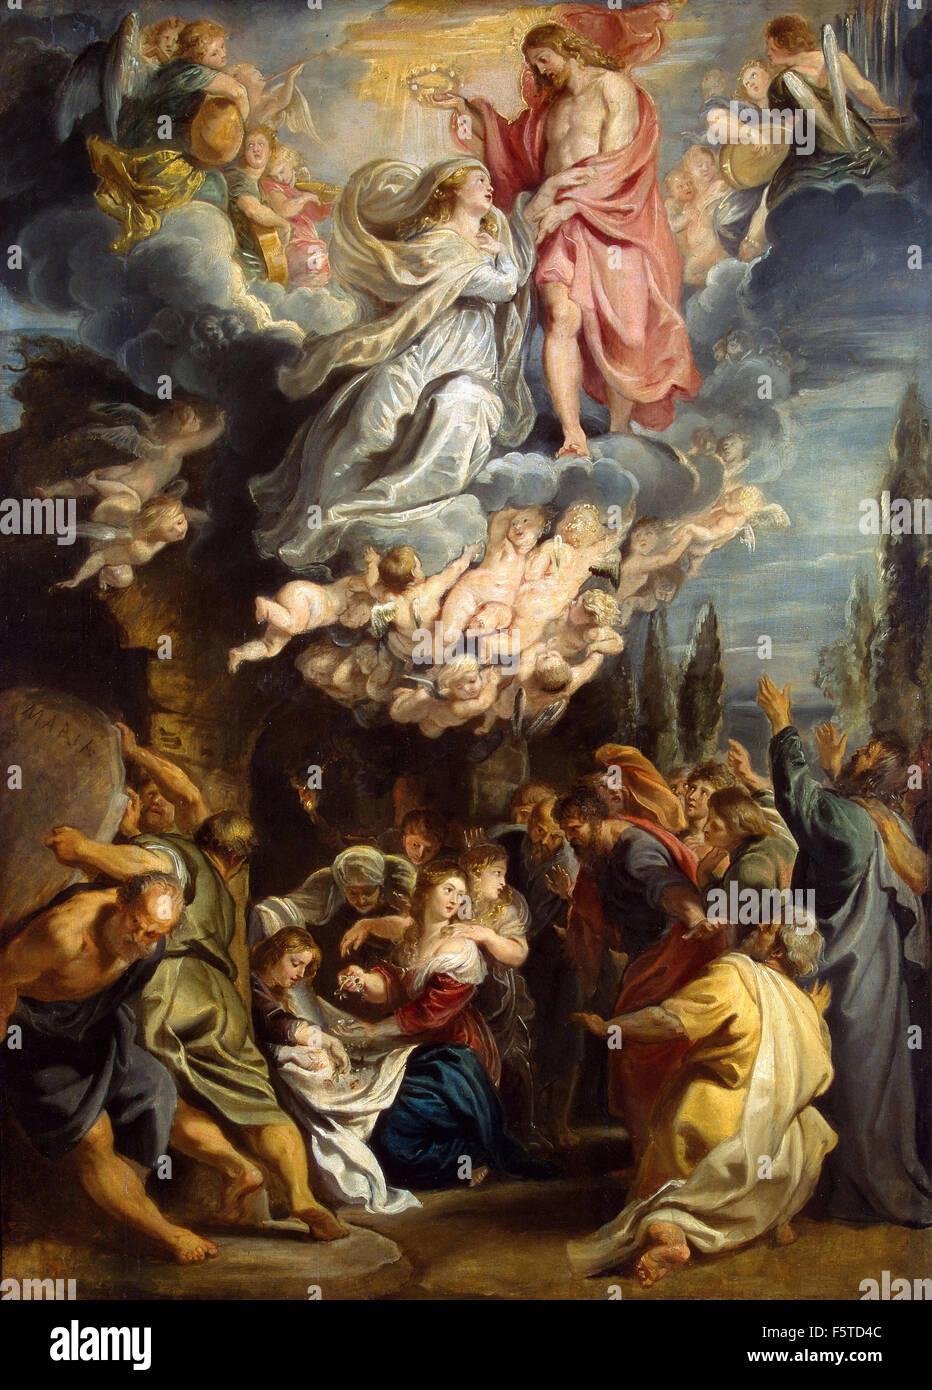 Peter Paul Rubens - Coronation of the Virgin - Stock Image